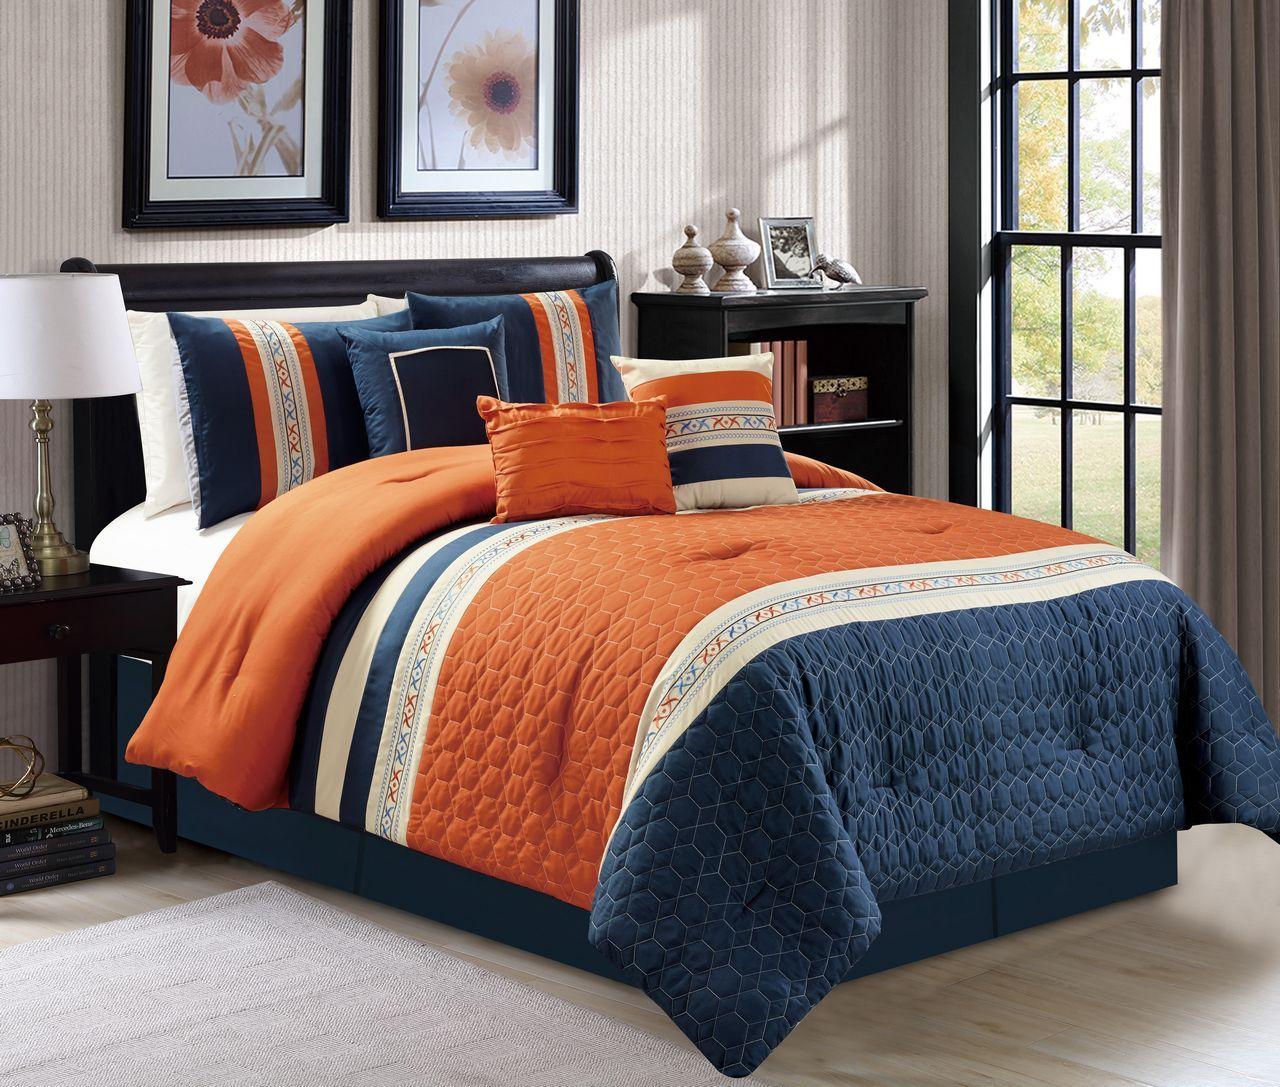 7 Piece Honeycomb Quilted Orange Navy Ivory Comforter Set Unique Bedding Sets Unique Beds Comforter Sets